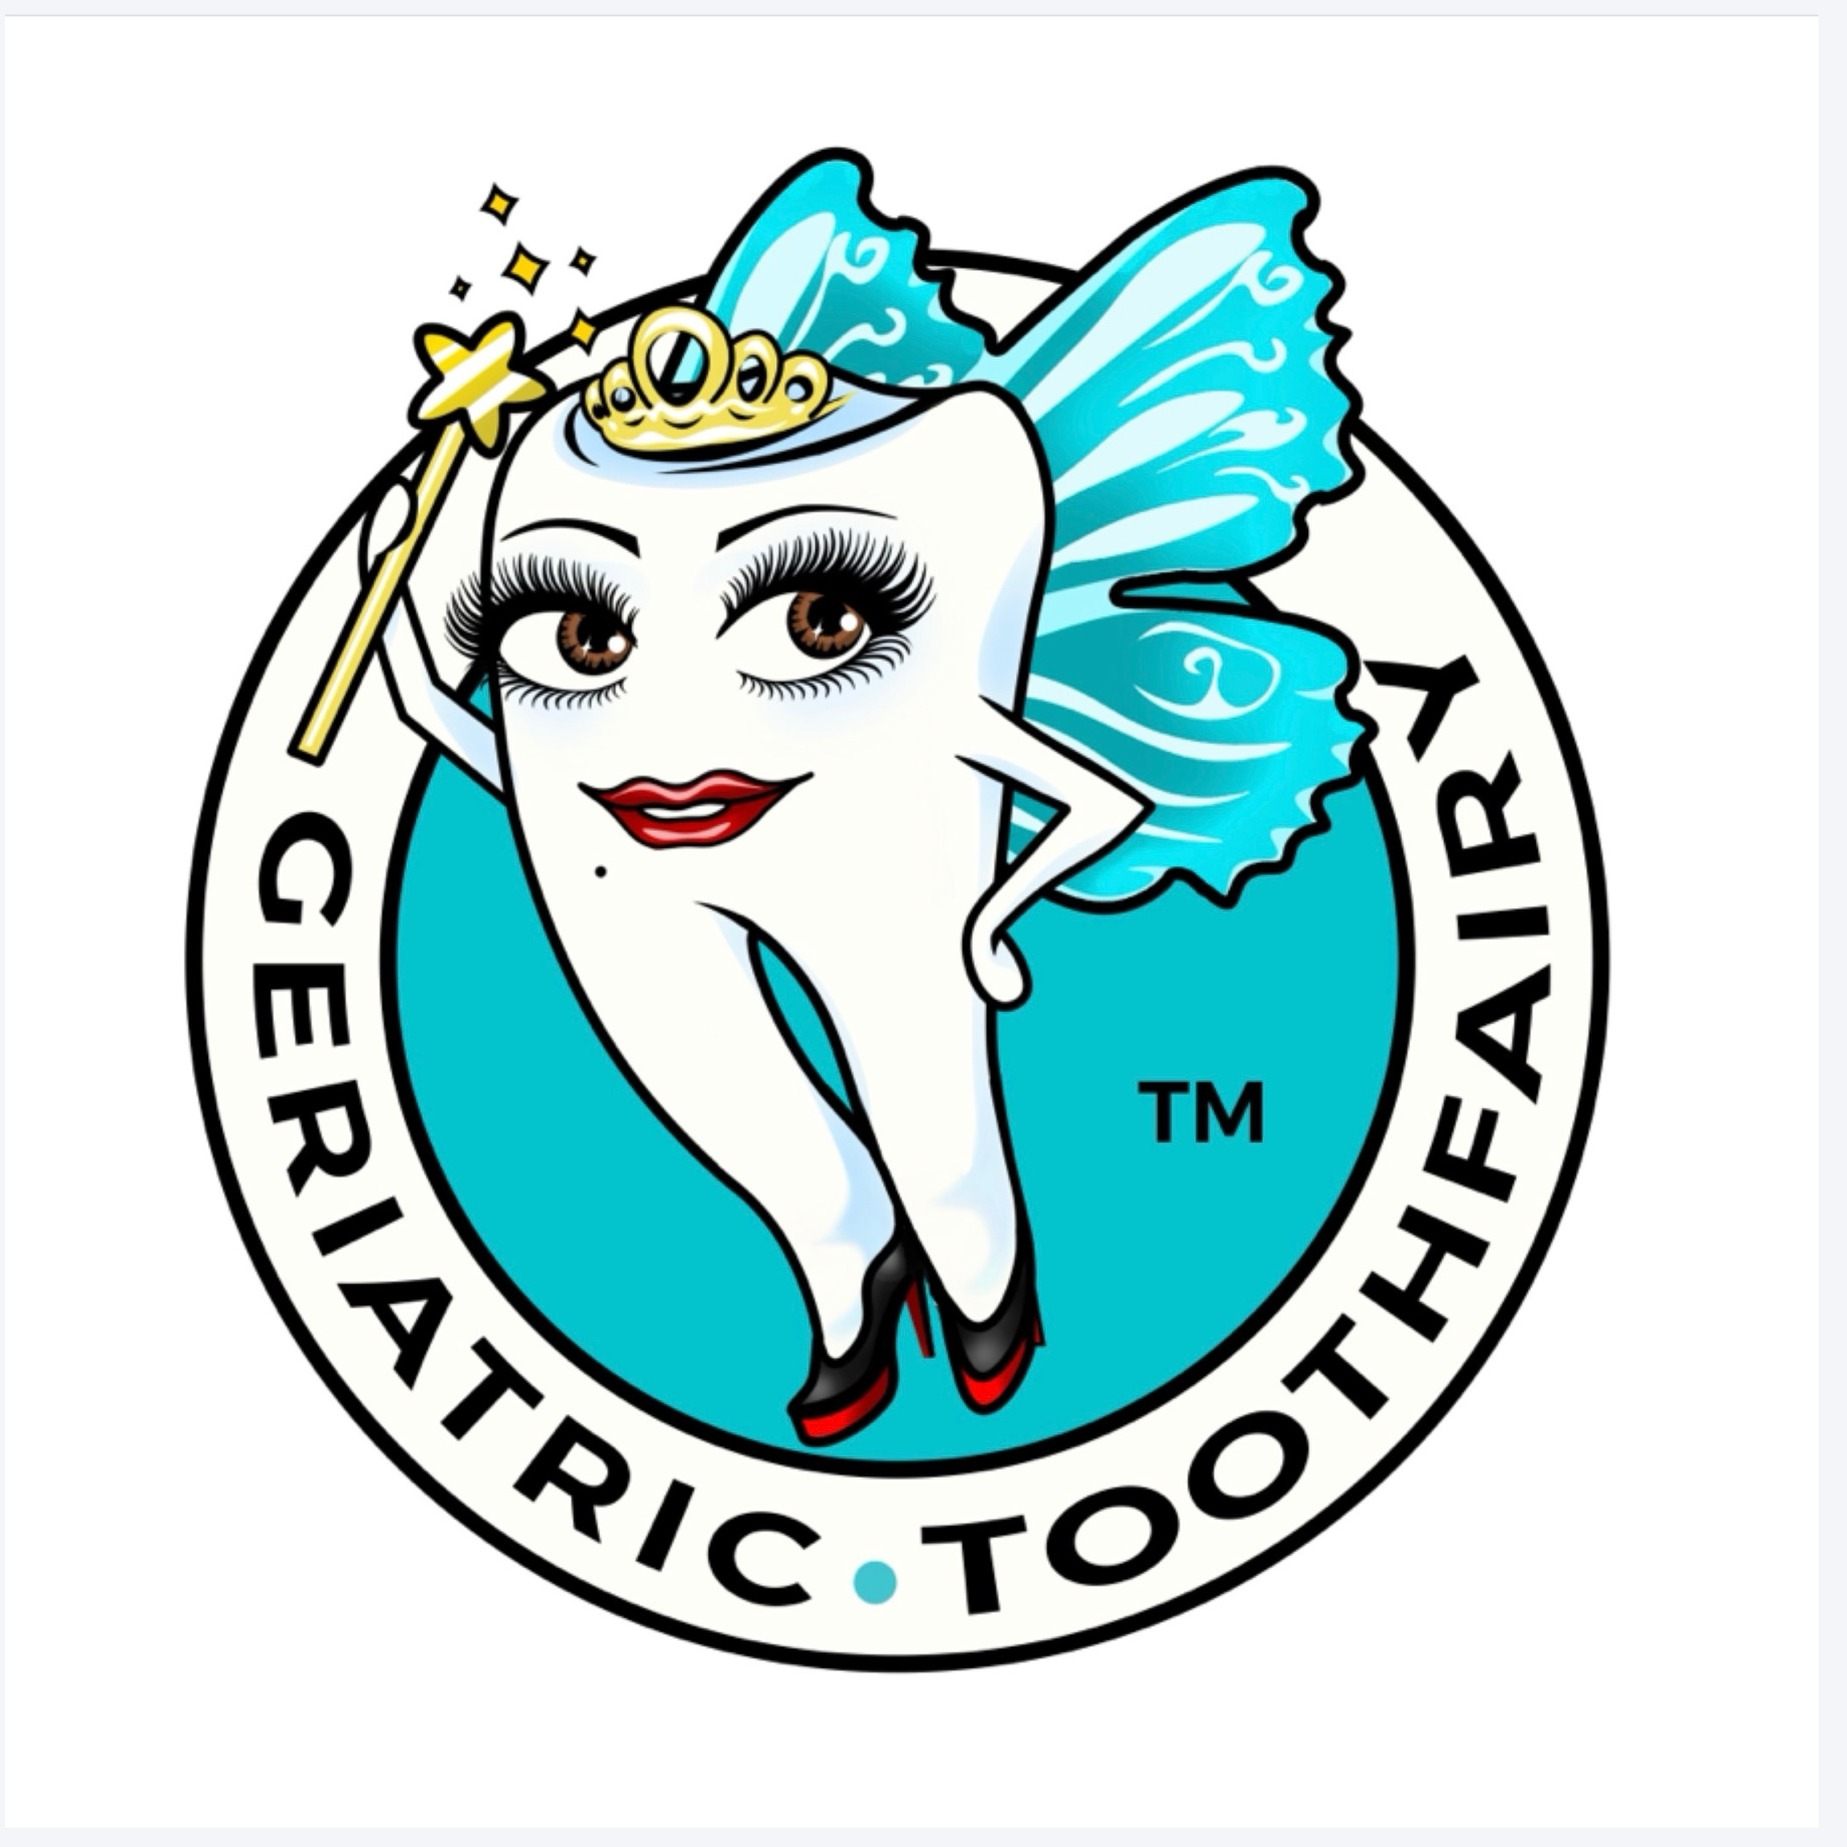 @geriatric_toothfairy Profile Image | Linktree